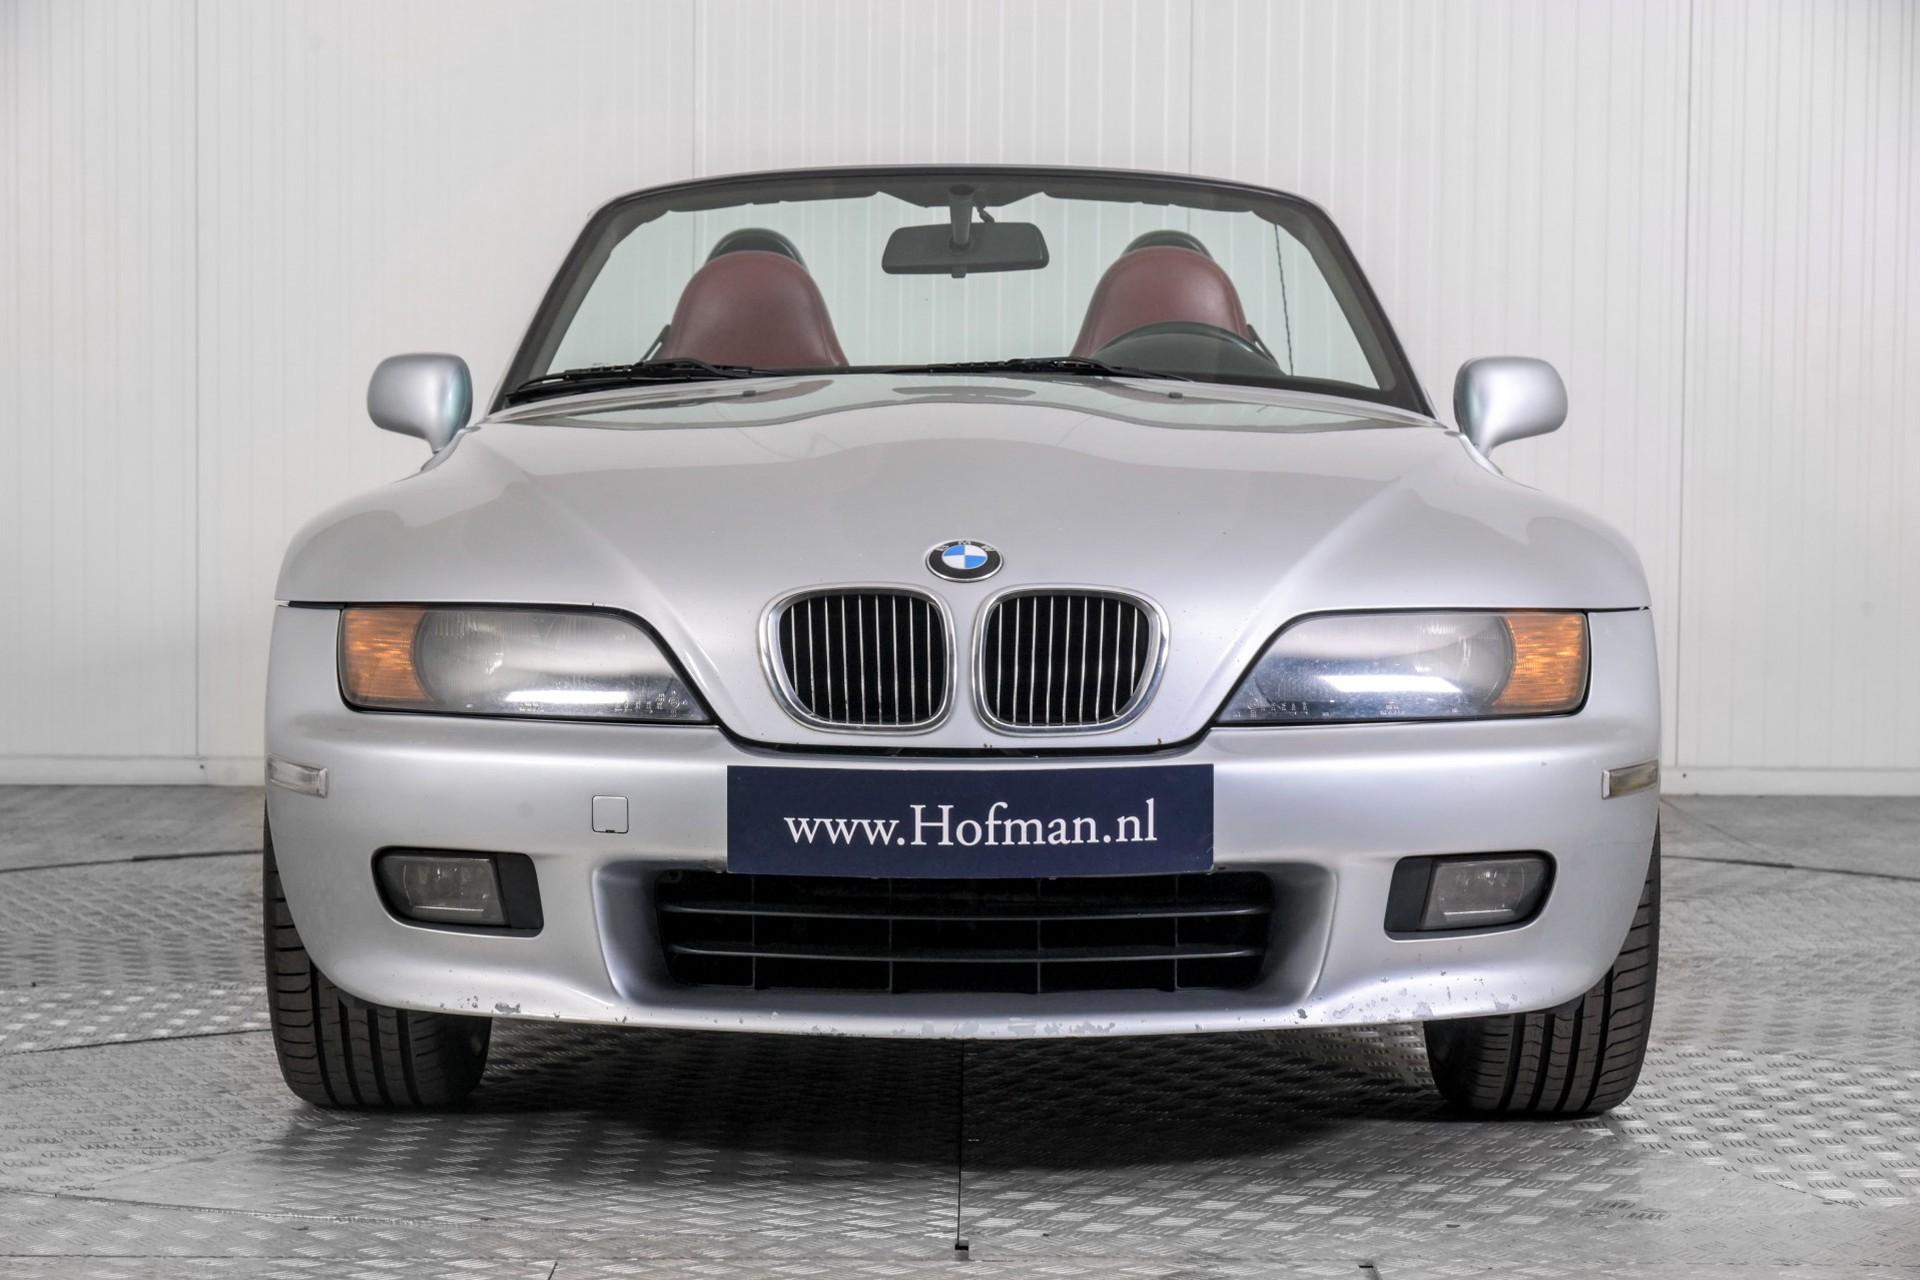 BMW Z3 Roadster 2.8 Foto 10